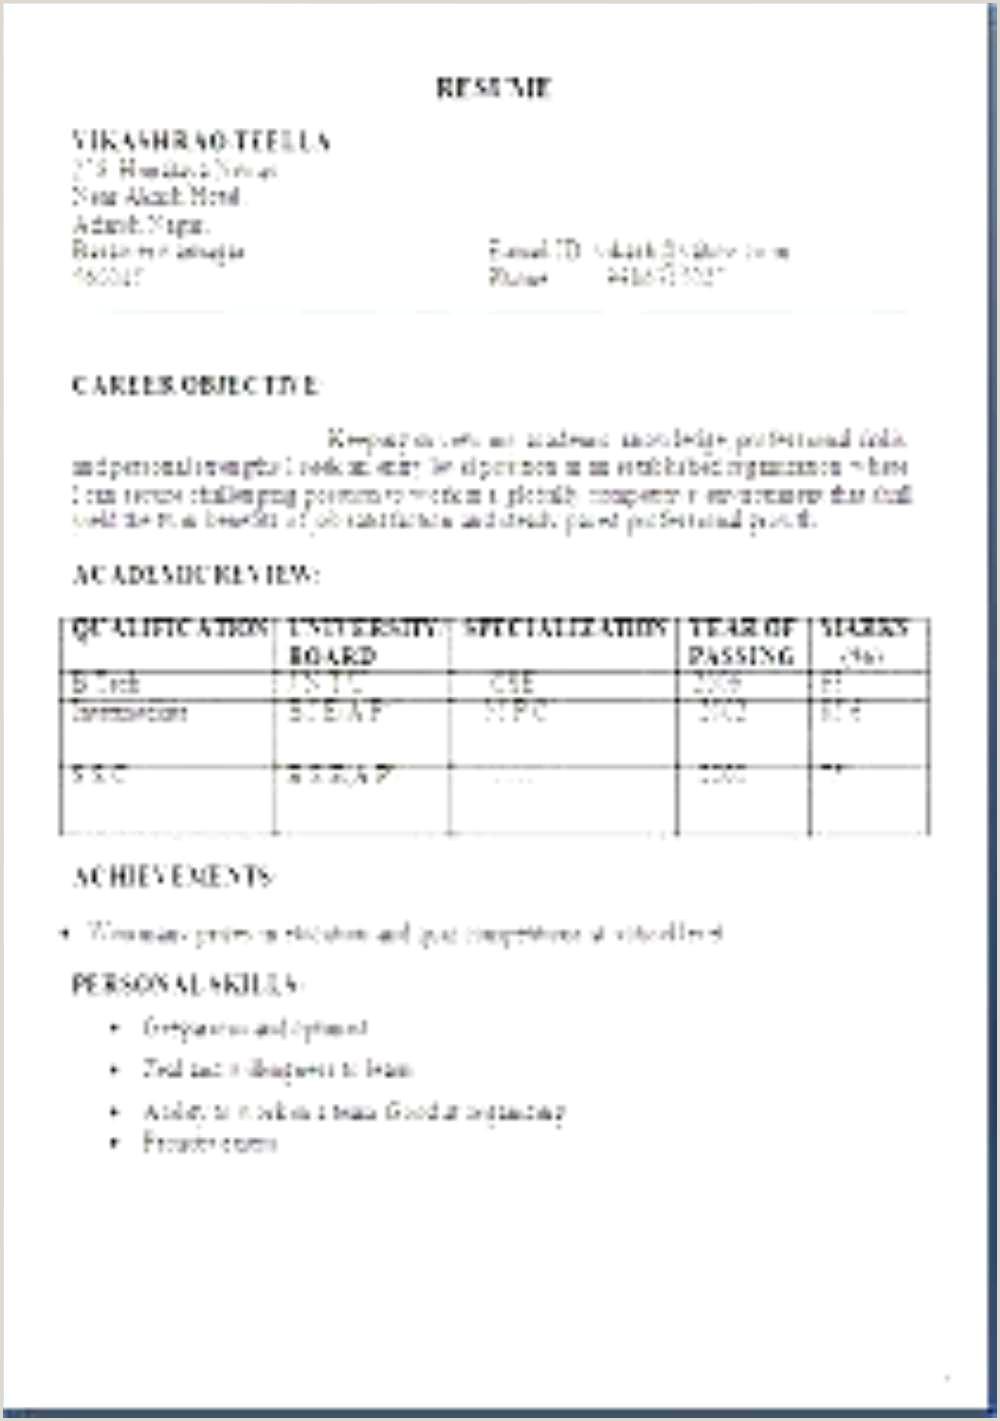 Professional Resume Formats Free Download Biodata Format